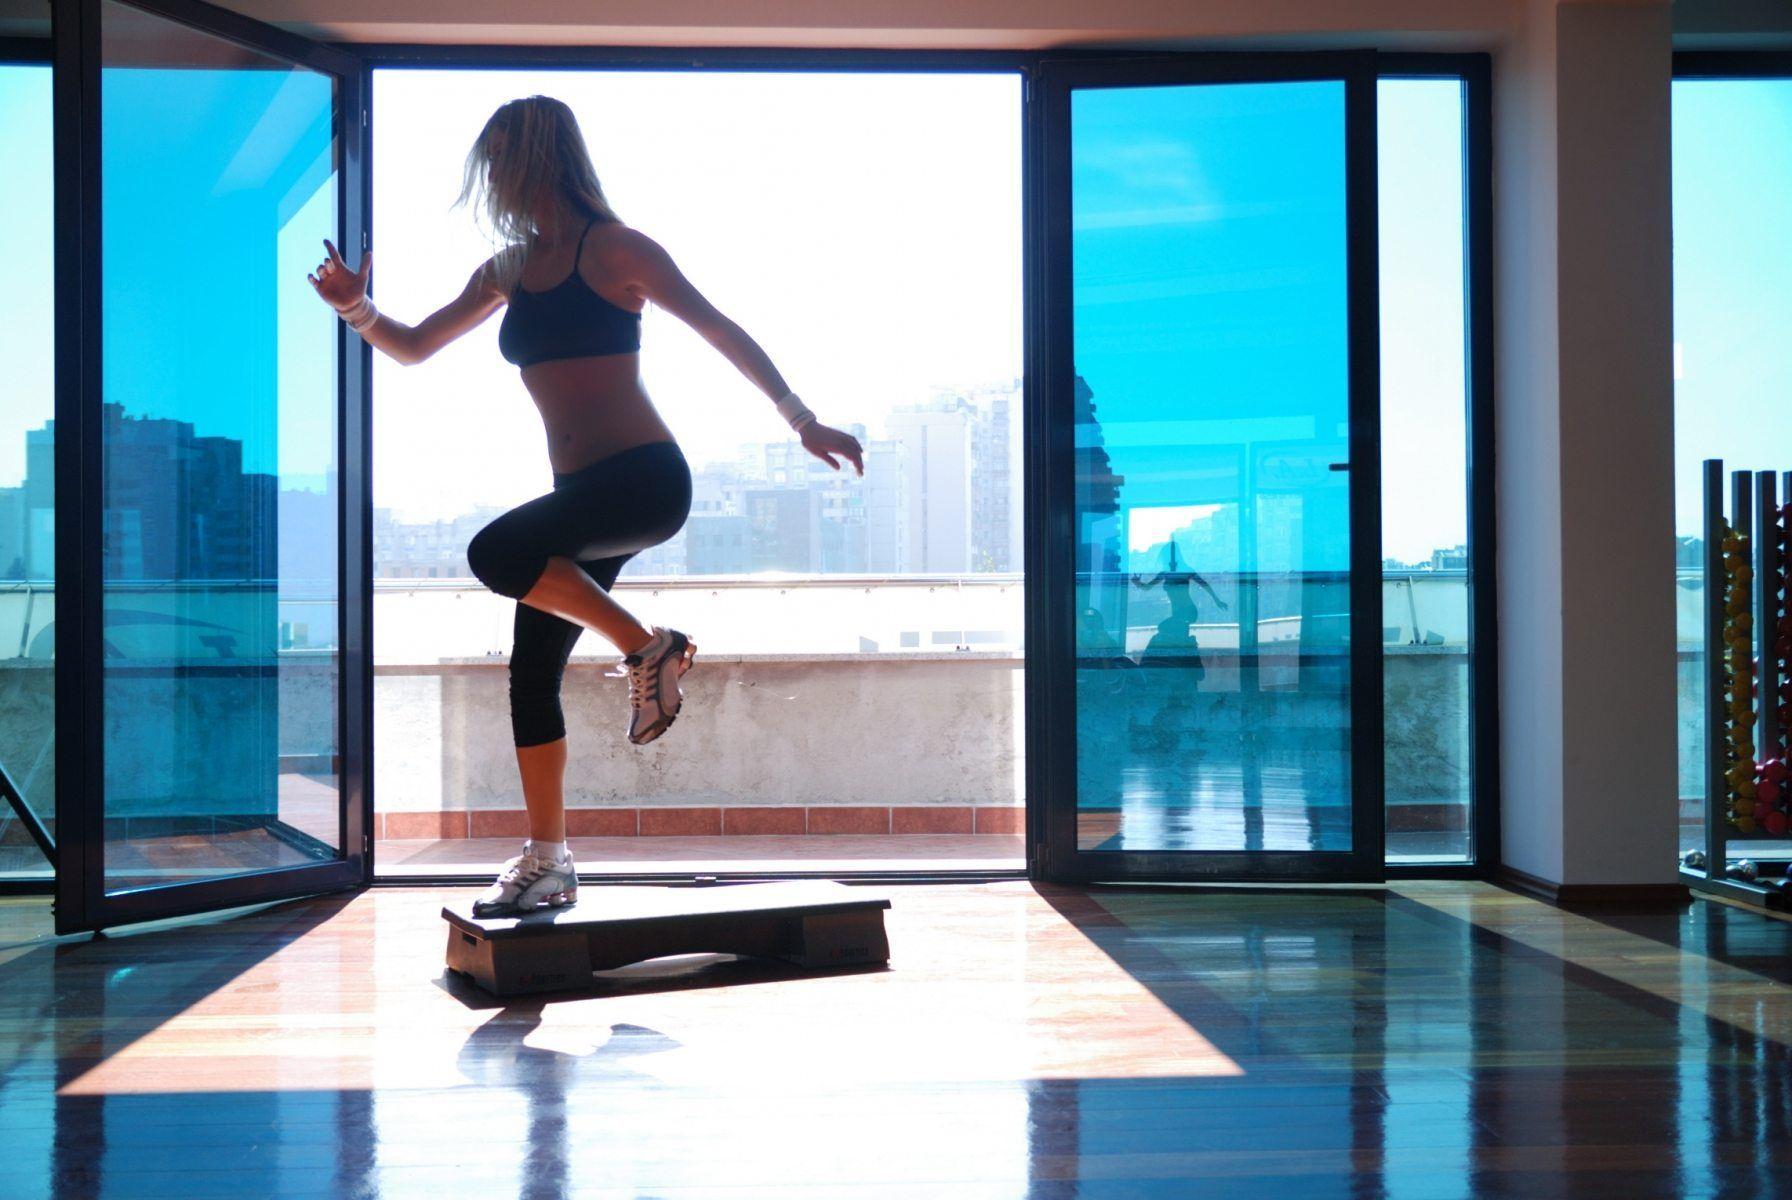 ejercicios para adelgazar